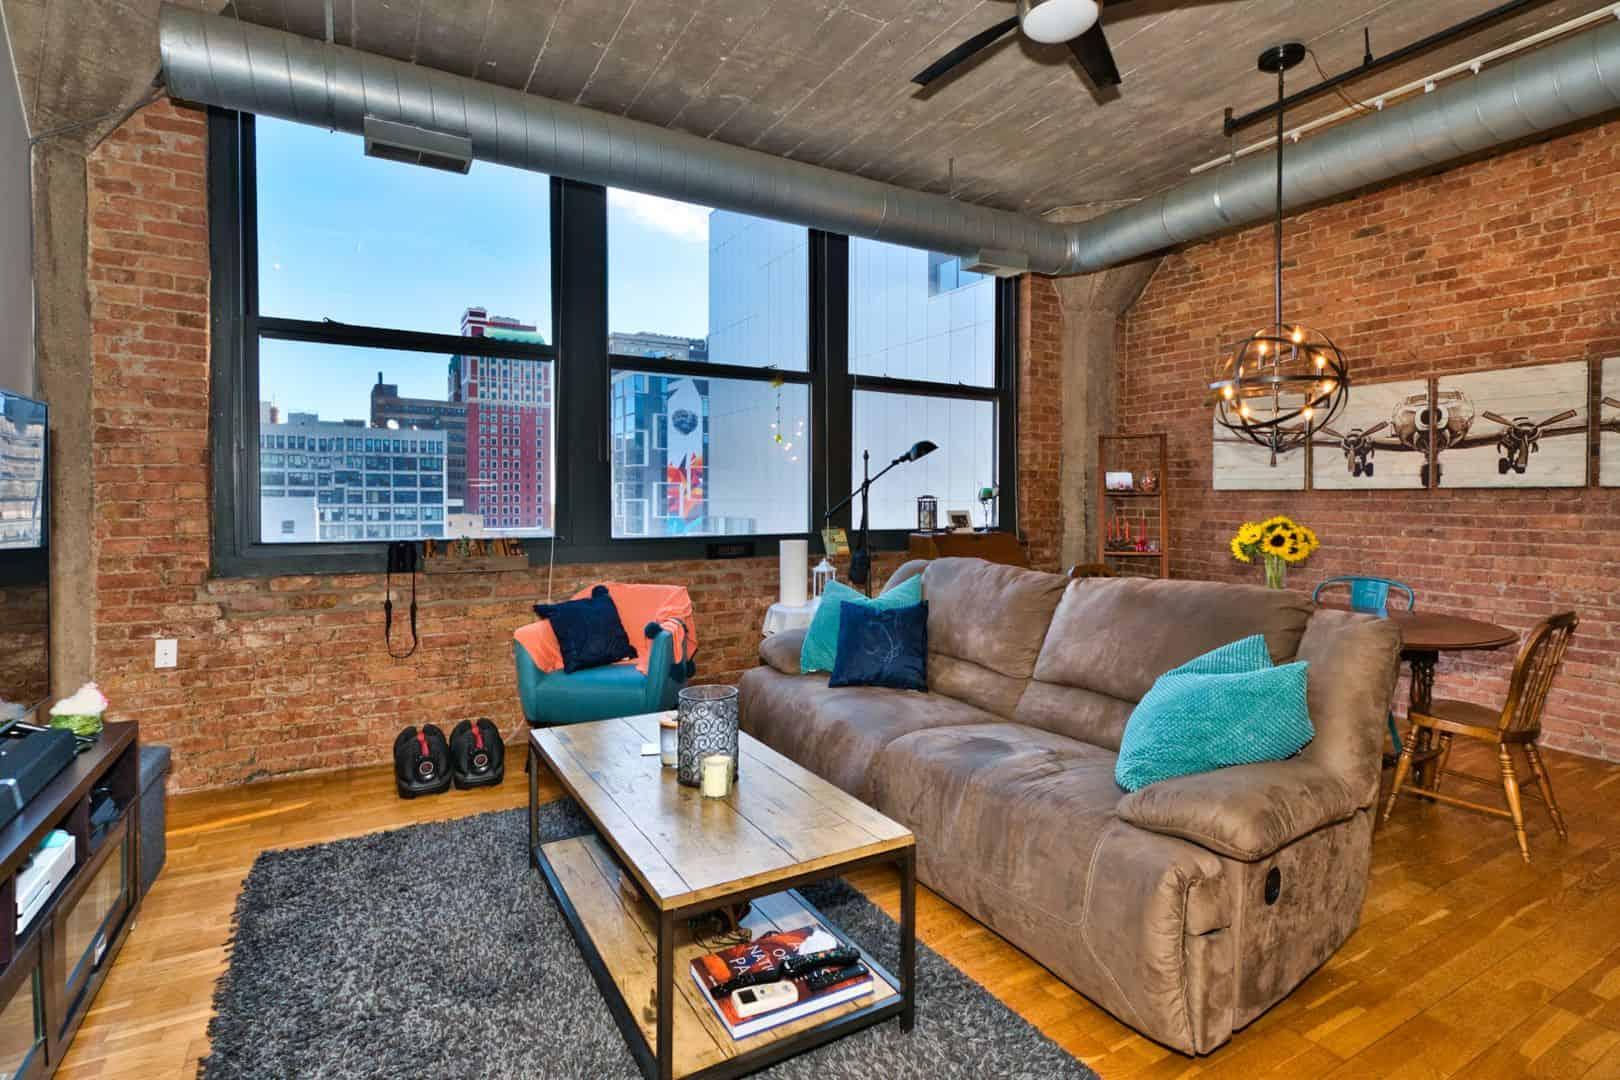 Printer's Row Concrete Loft - 621 S Plymouth Court, Unit 810, Chicago IL 60605 USA - Living Area Windows